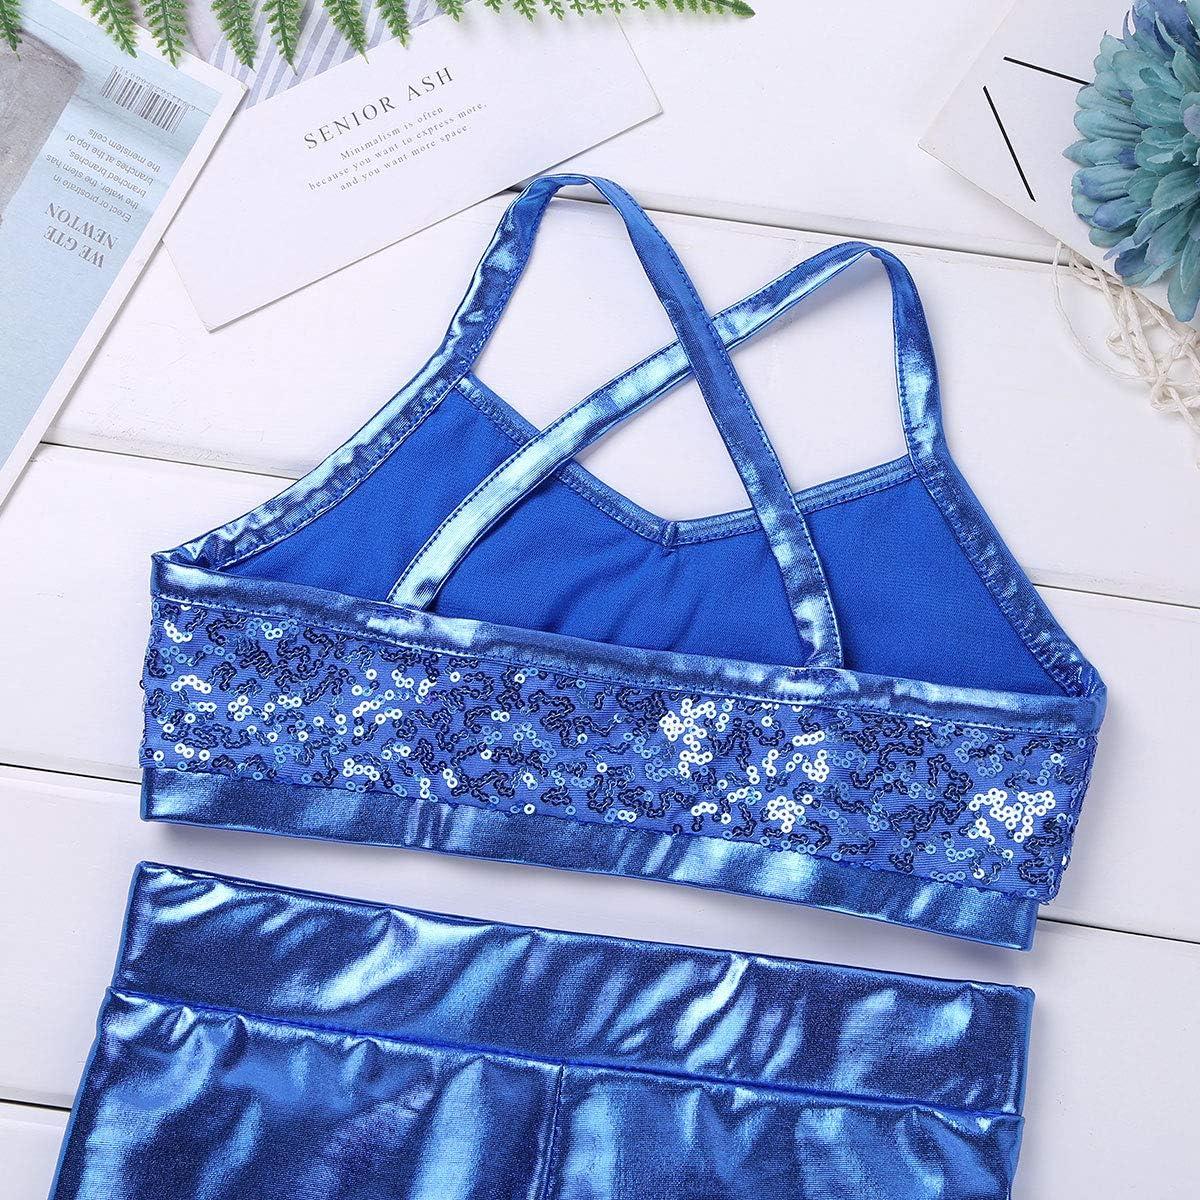 Freebily 2pcs Girls Tankini Swimsuit Set Tank Top Bra with Boyshort Bottoms Dance Outfit Summer Beach Sport Swim Bathing Suit